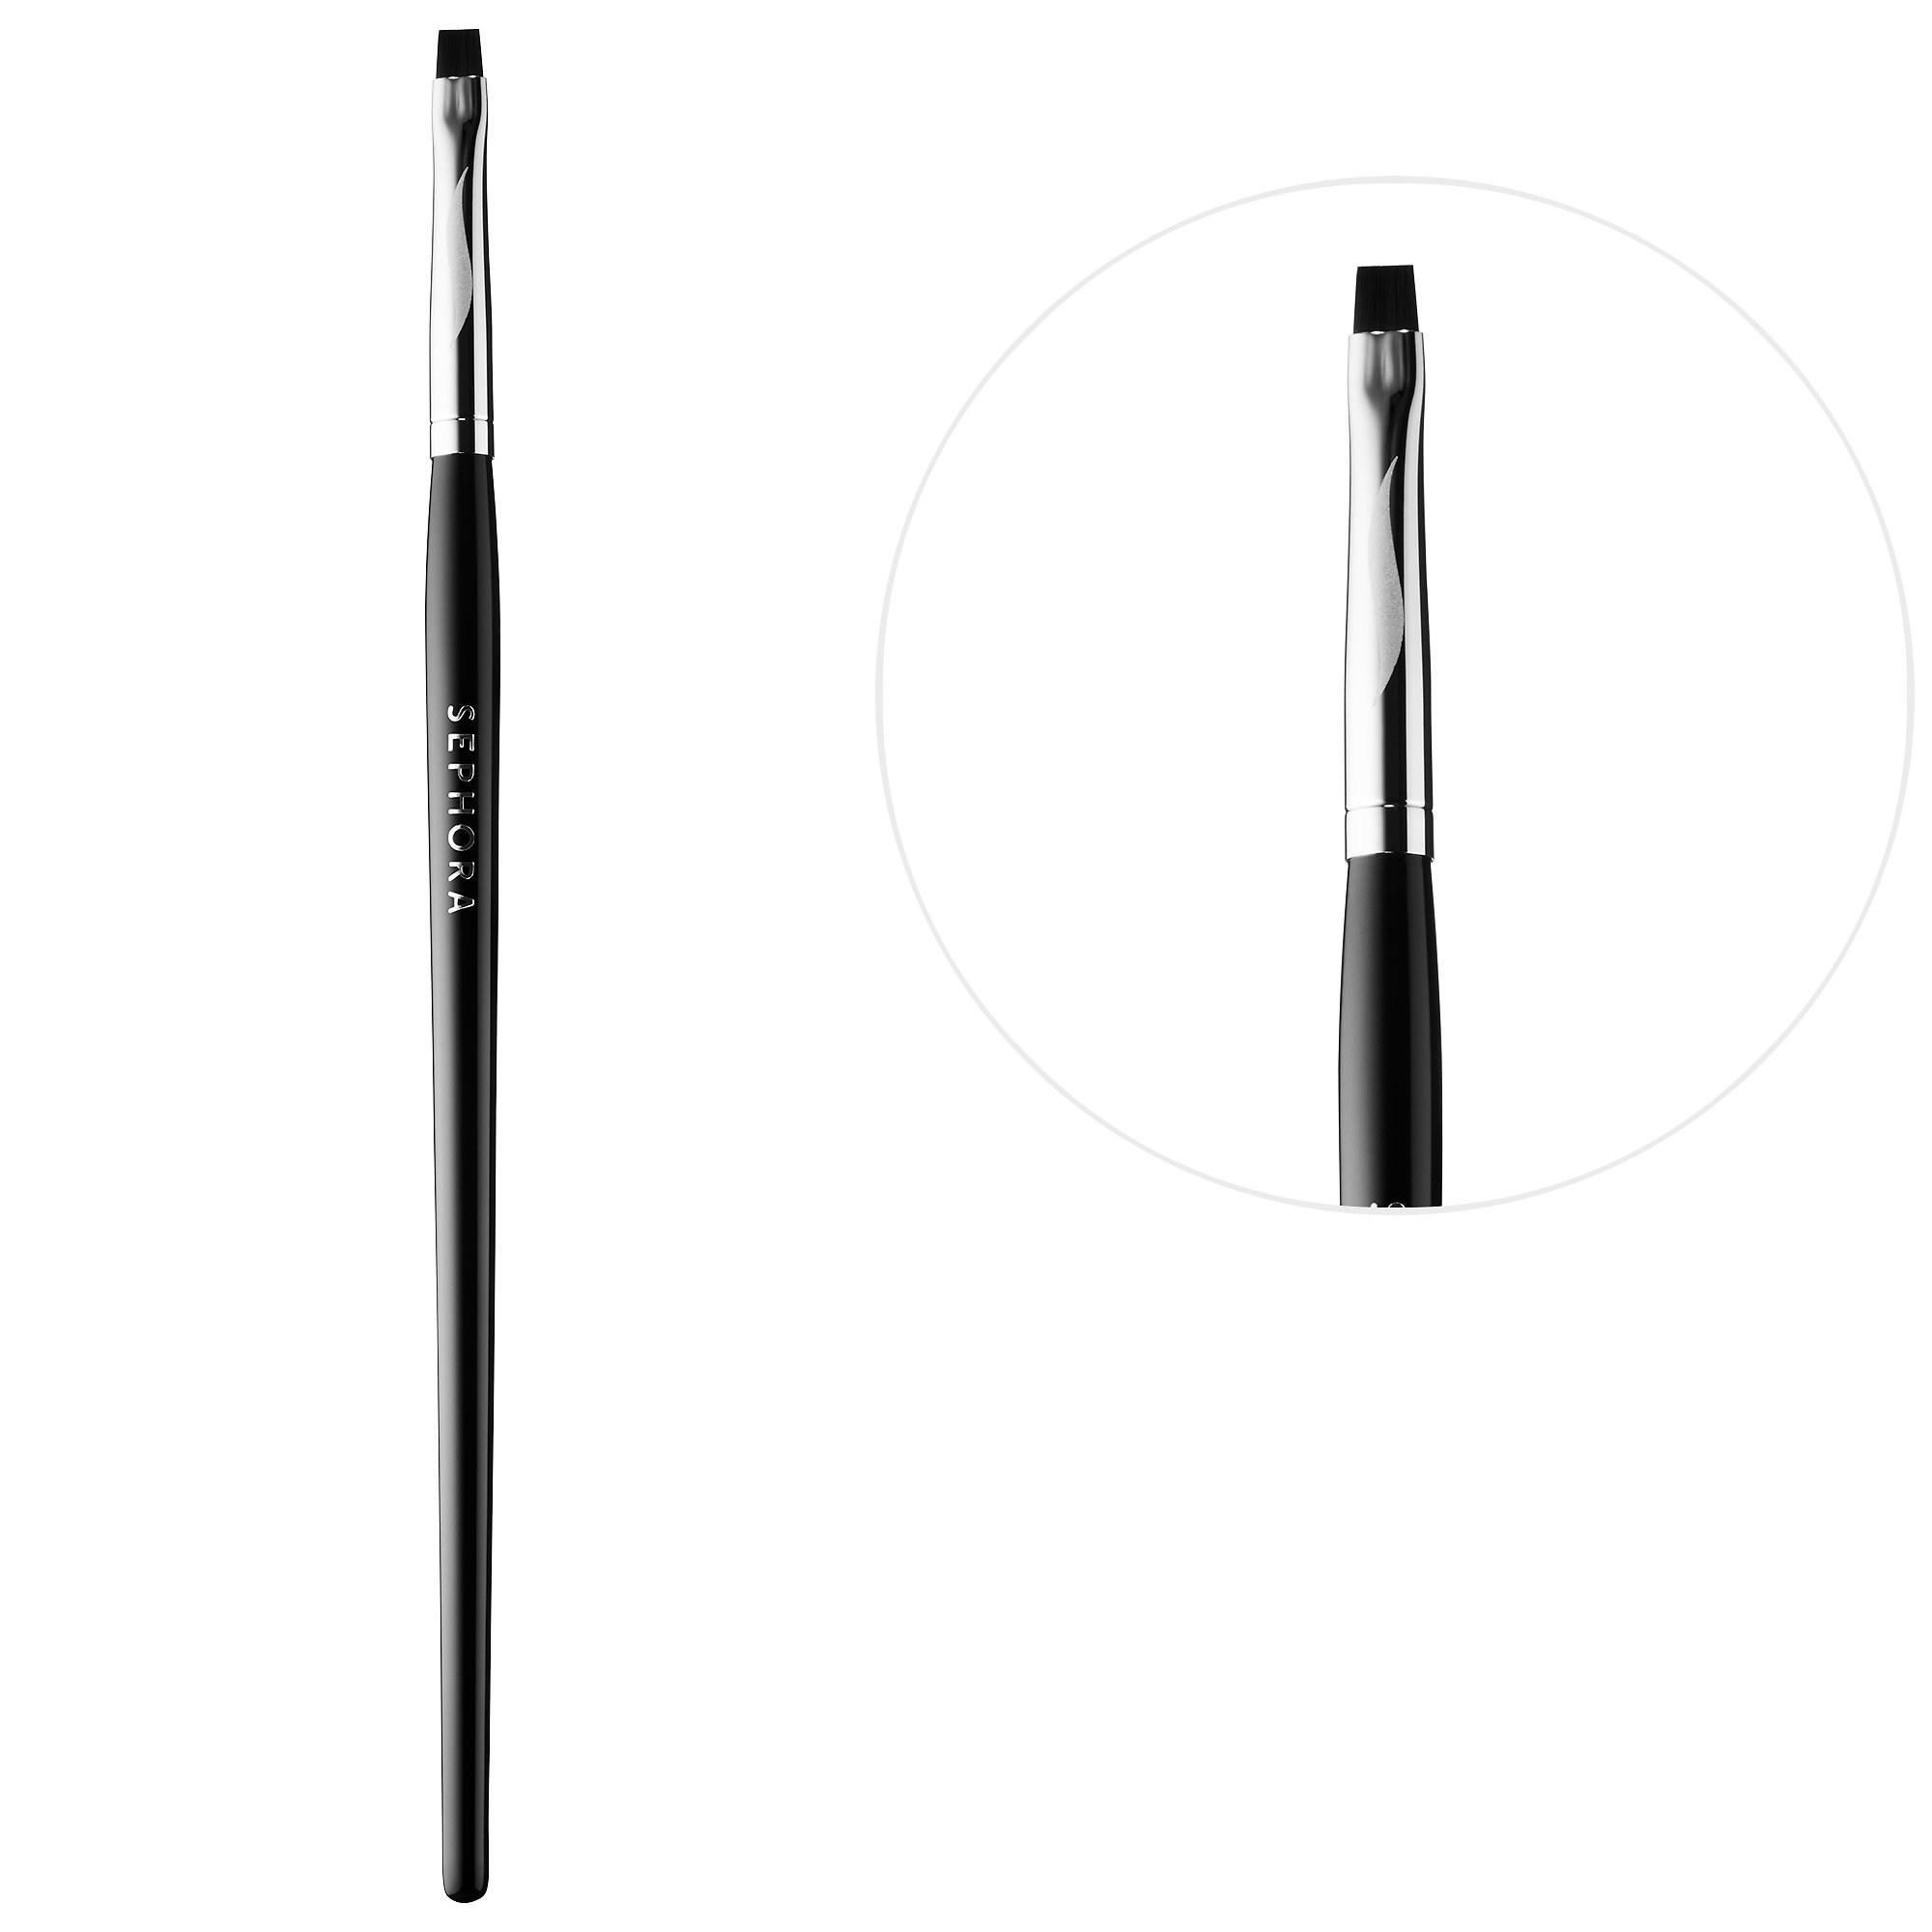 Sephora Tightline Liner Brush #32